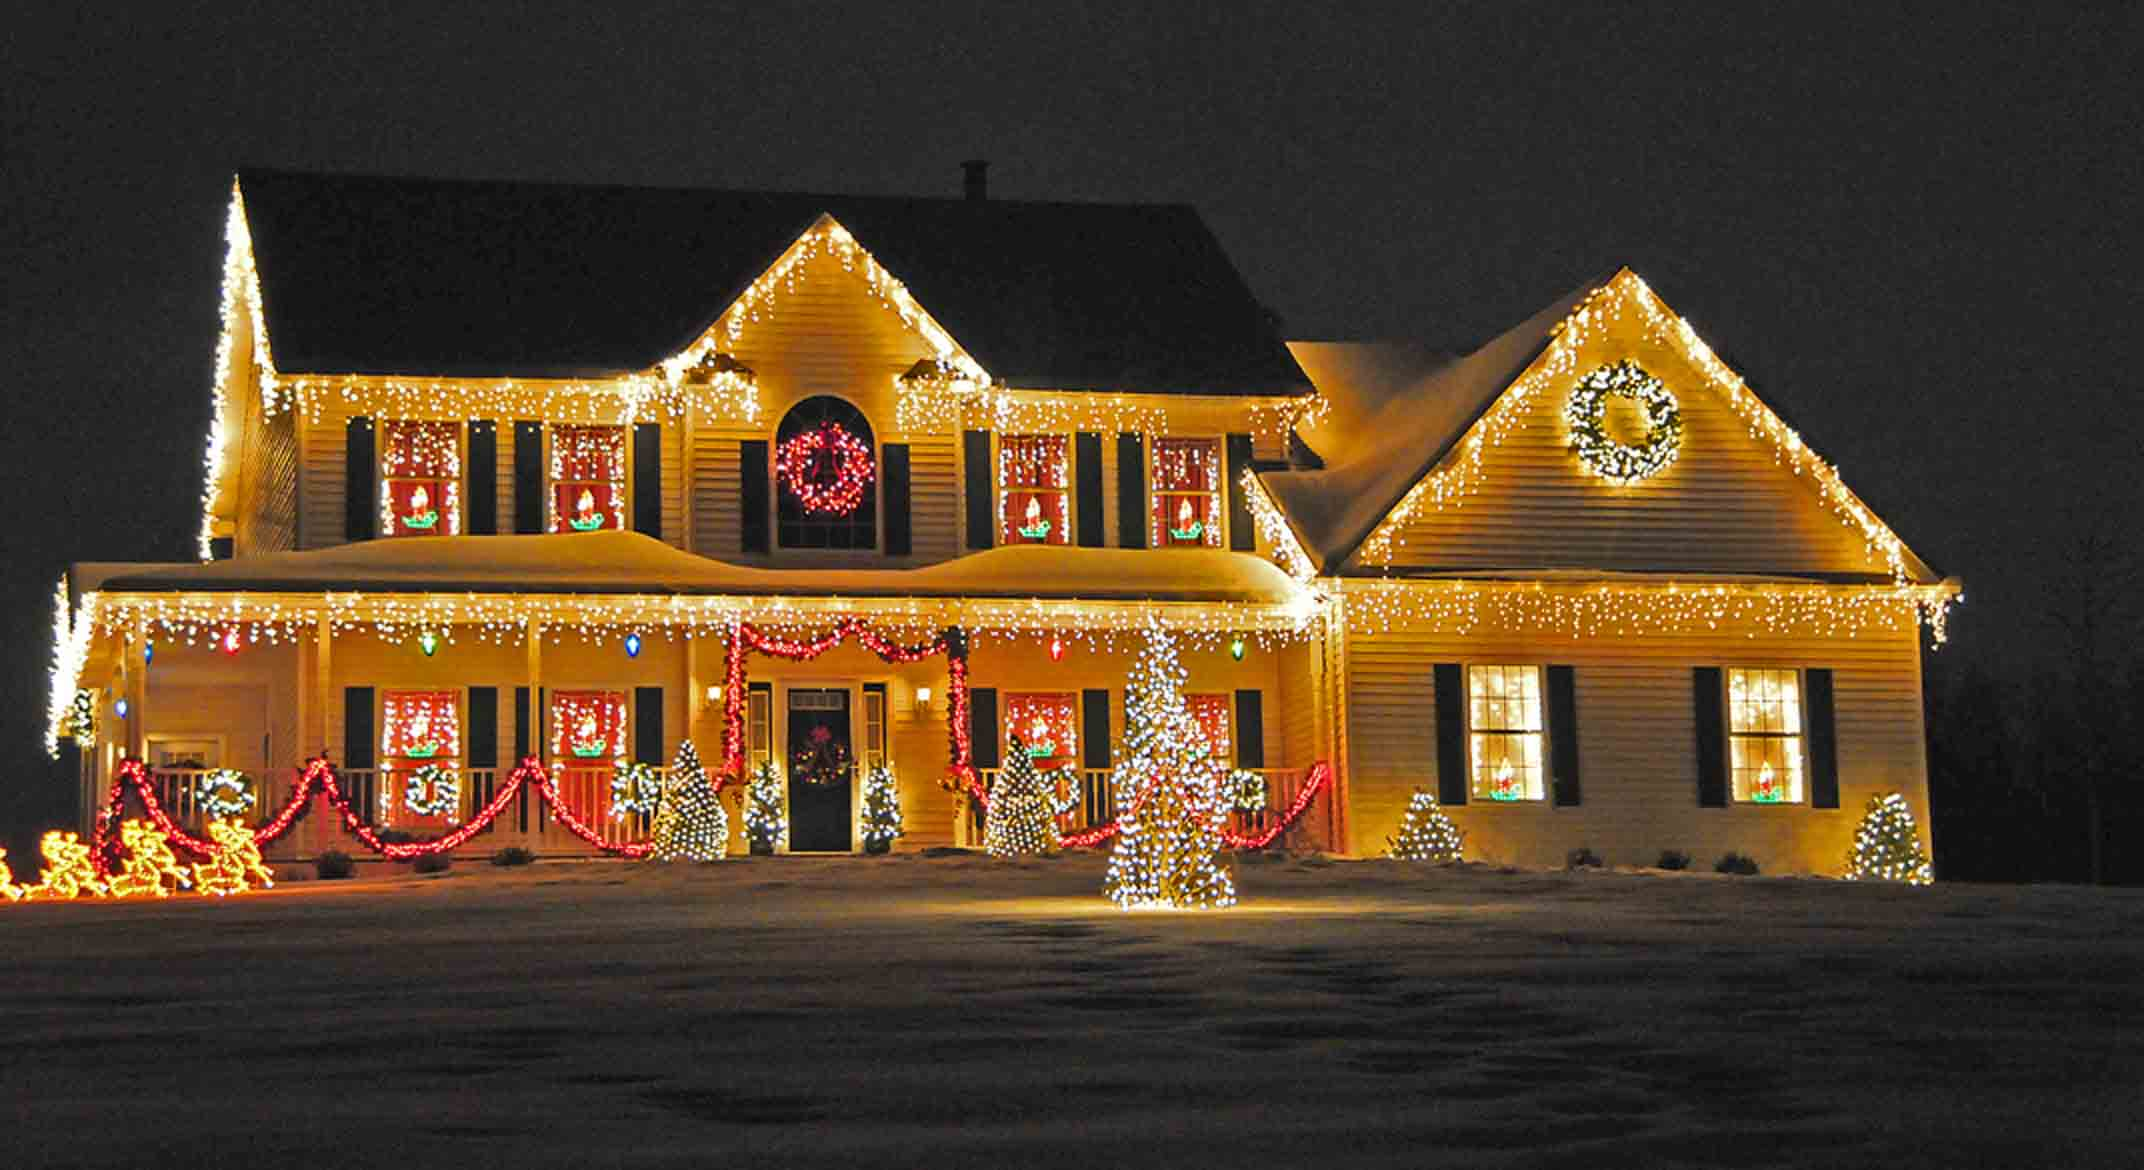 Decorative Christmas Lights